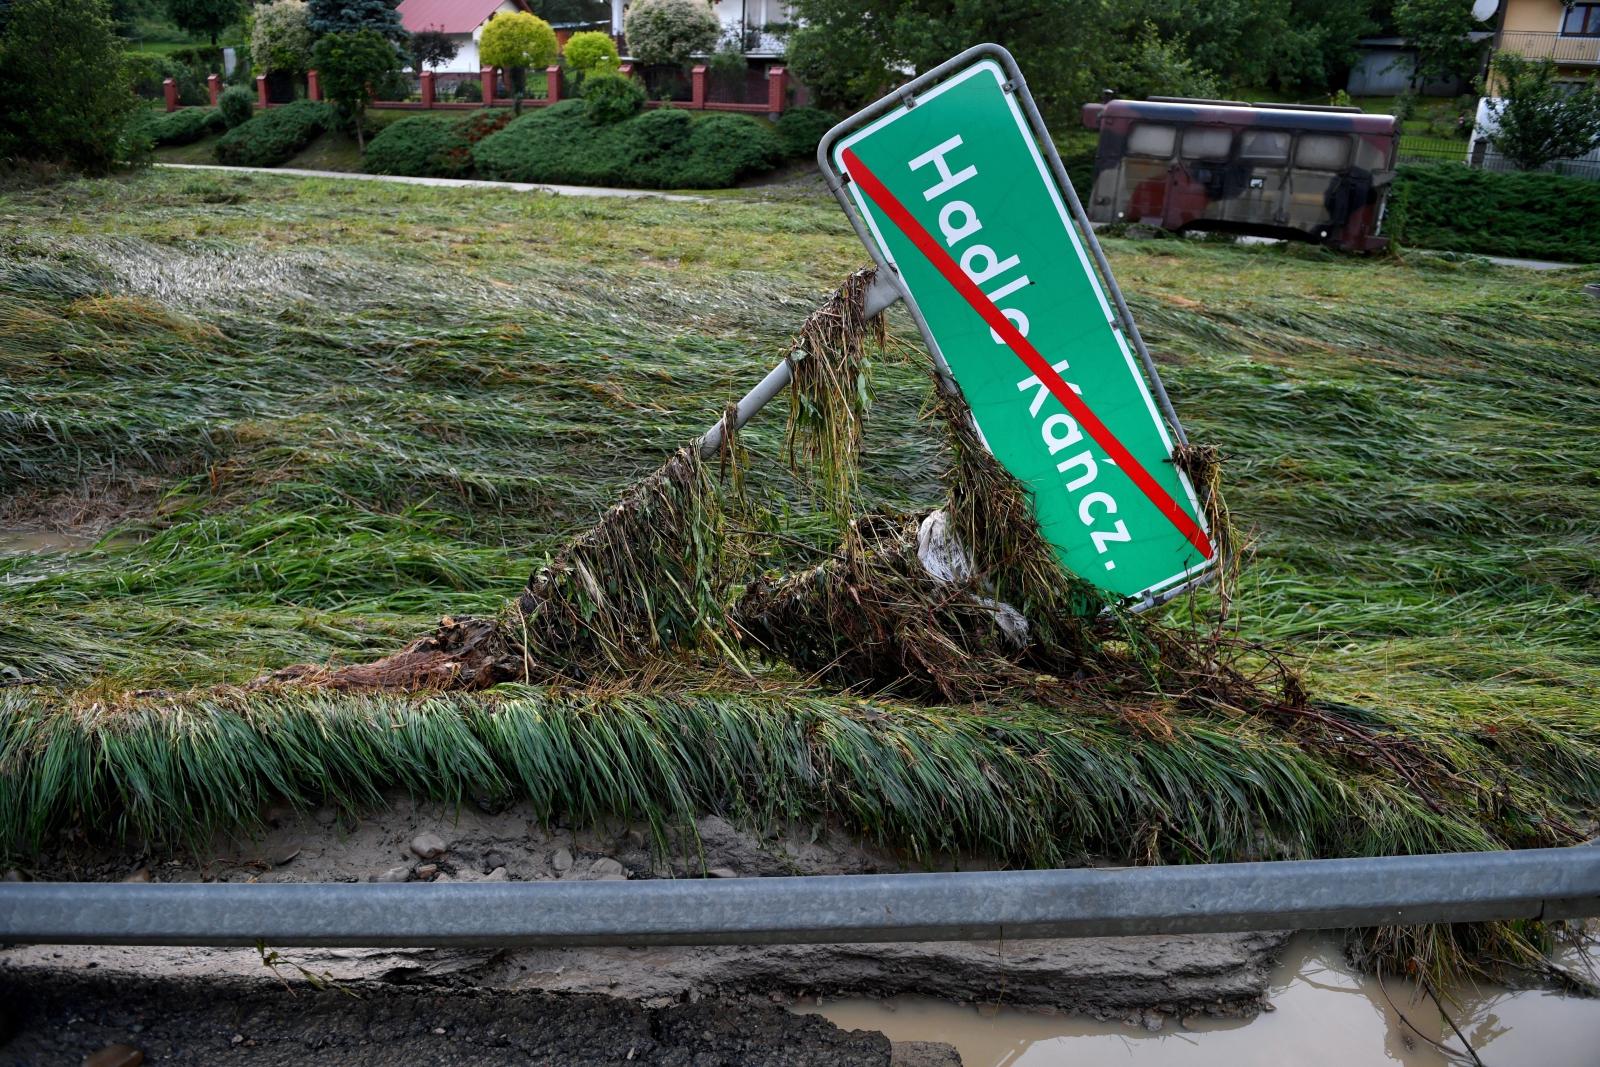 Powódź na podkarpaciu PAP/Darek Delmanowicz